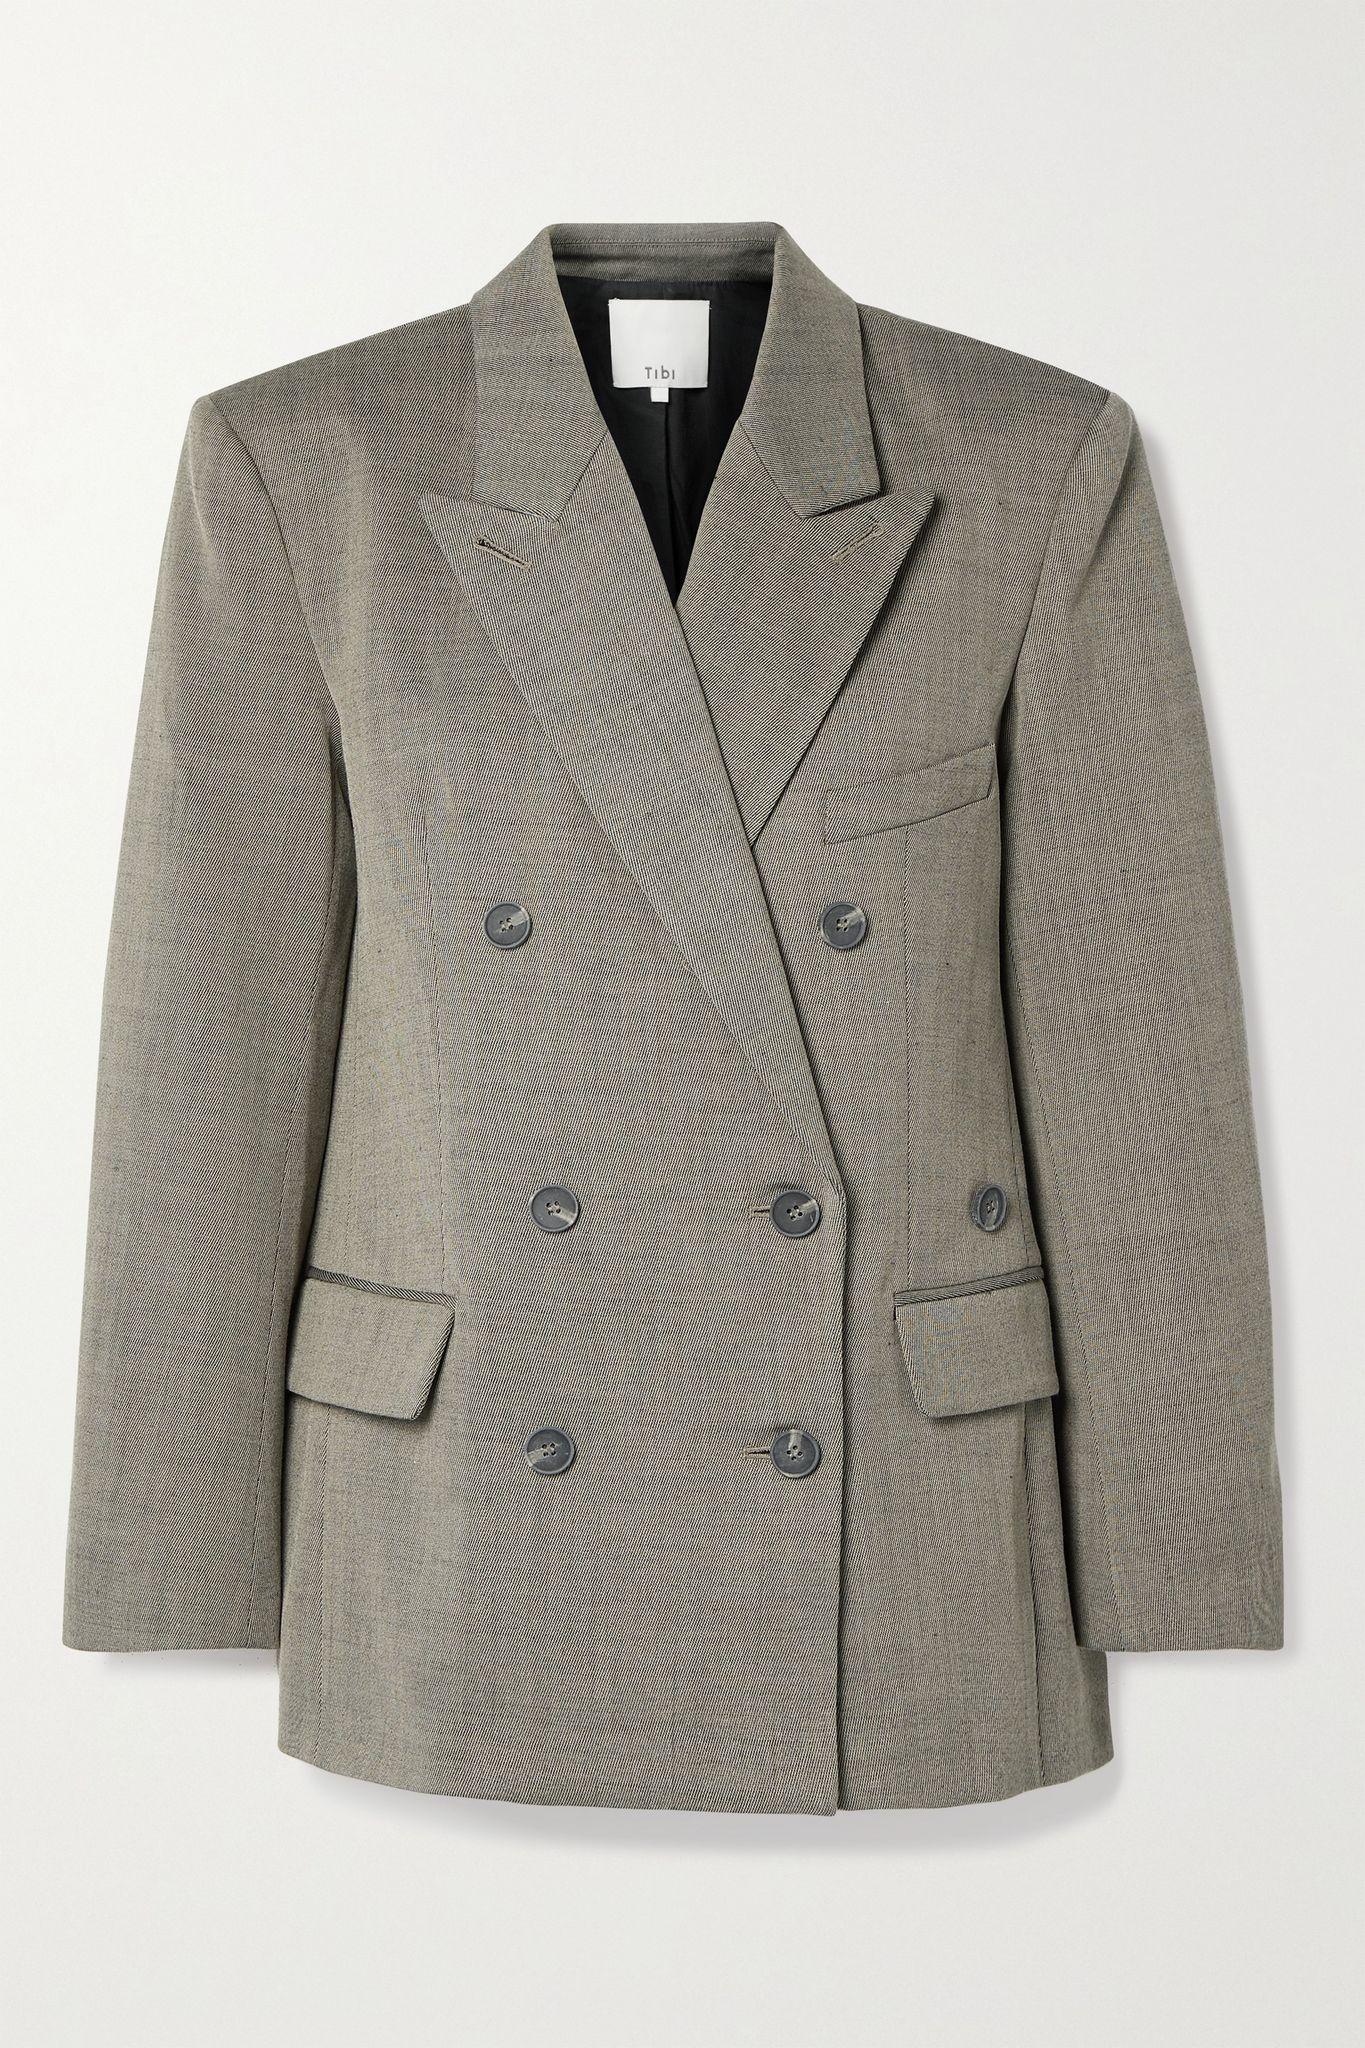 Style File | Shopping List: A Few of Daniela's Favourite Blazers